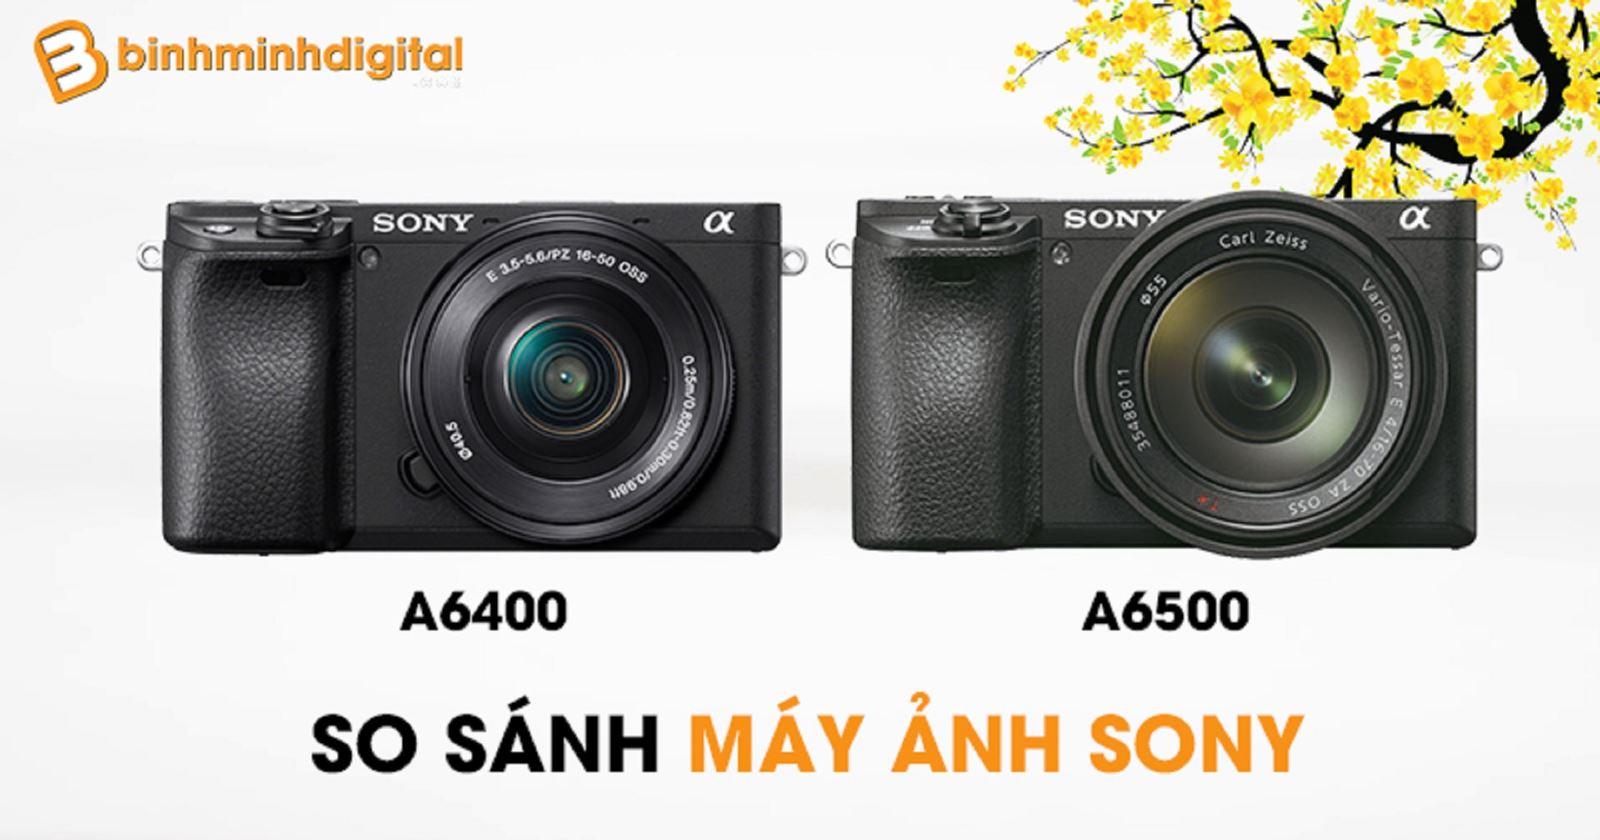 So sánh máy ảnh Sony a6400 và a6500